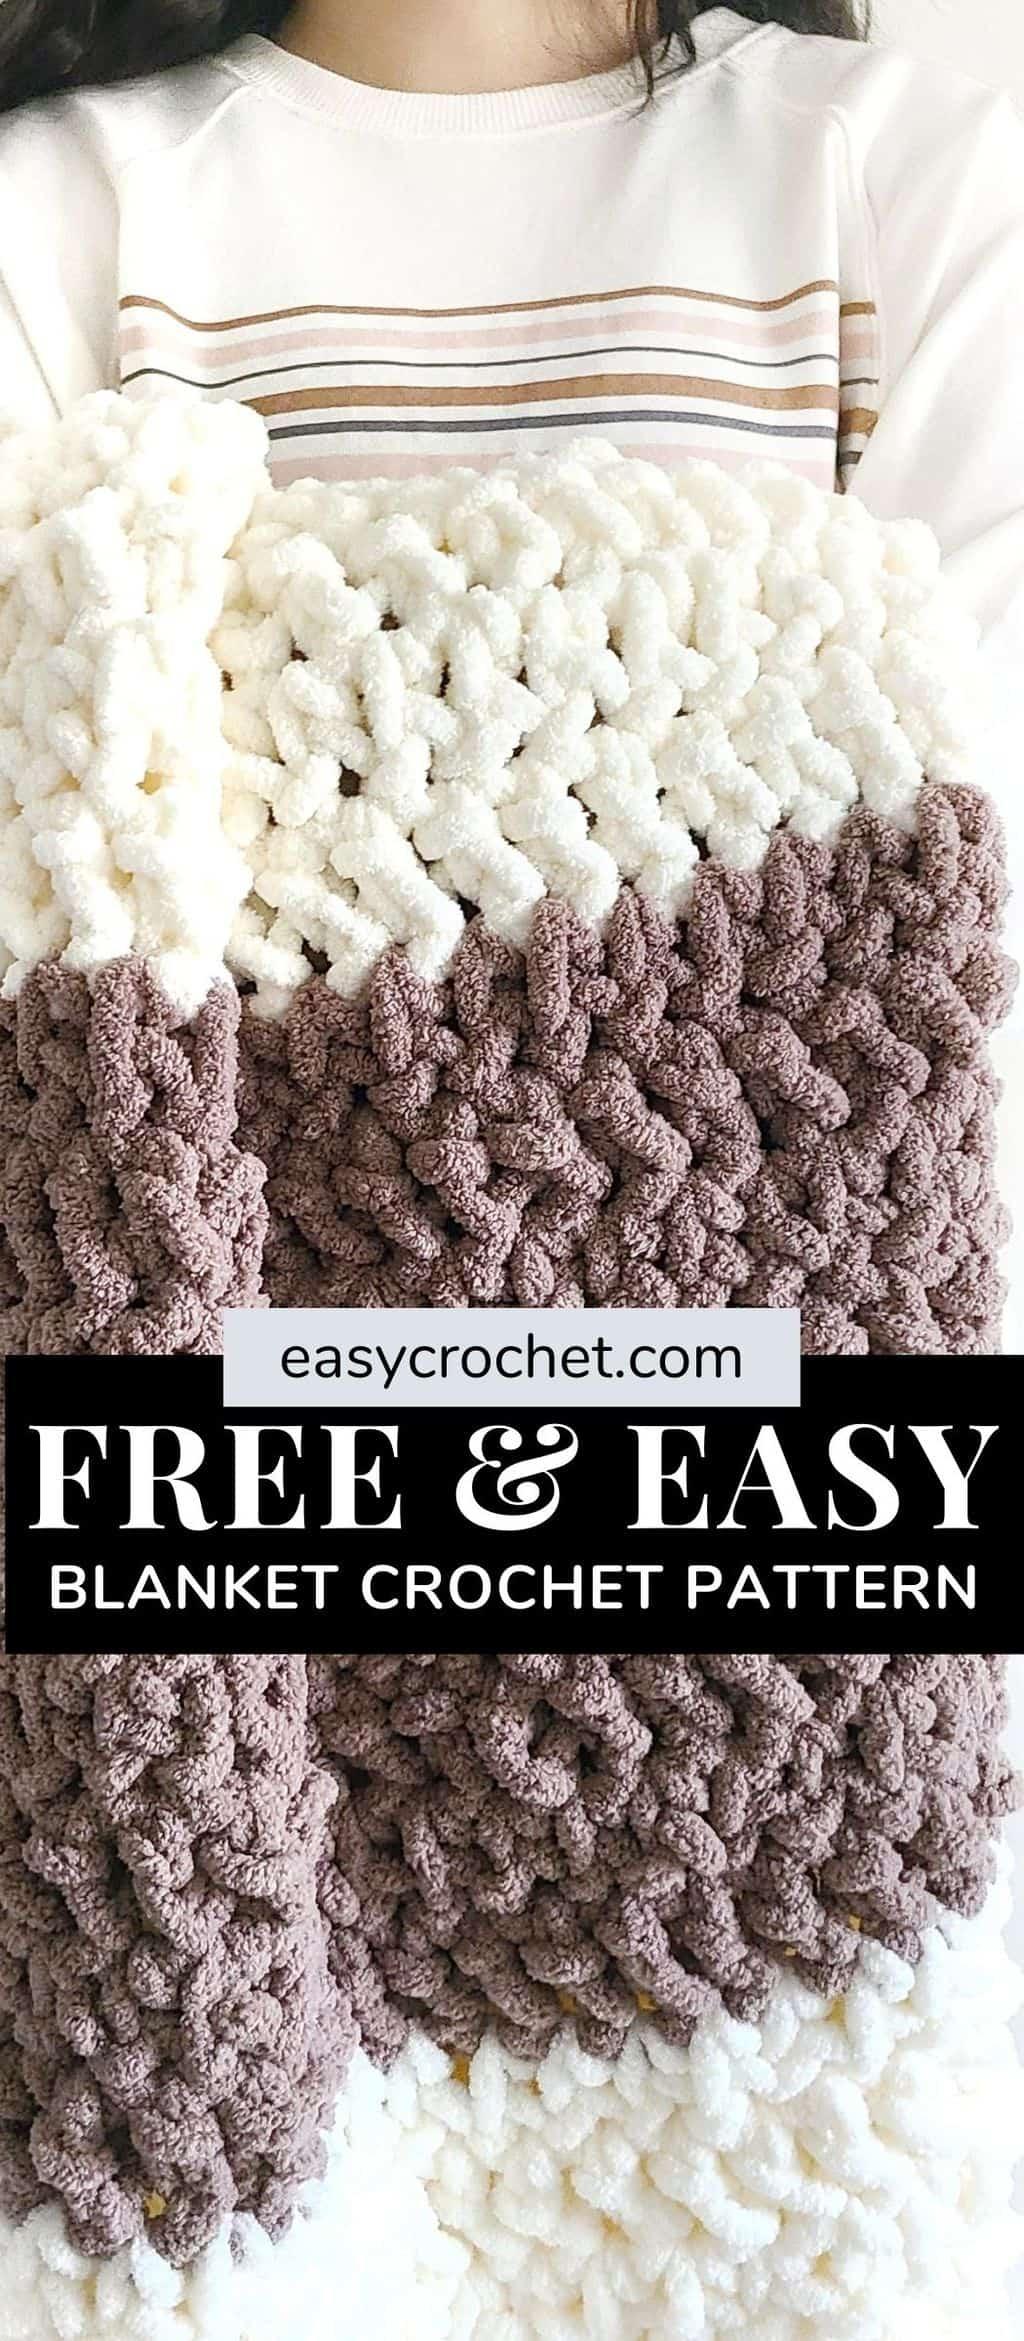 Free Jumbo Yarn Crochet Blanket pattern using Bernat Blanket Extra Yarn via @easycrochetcom